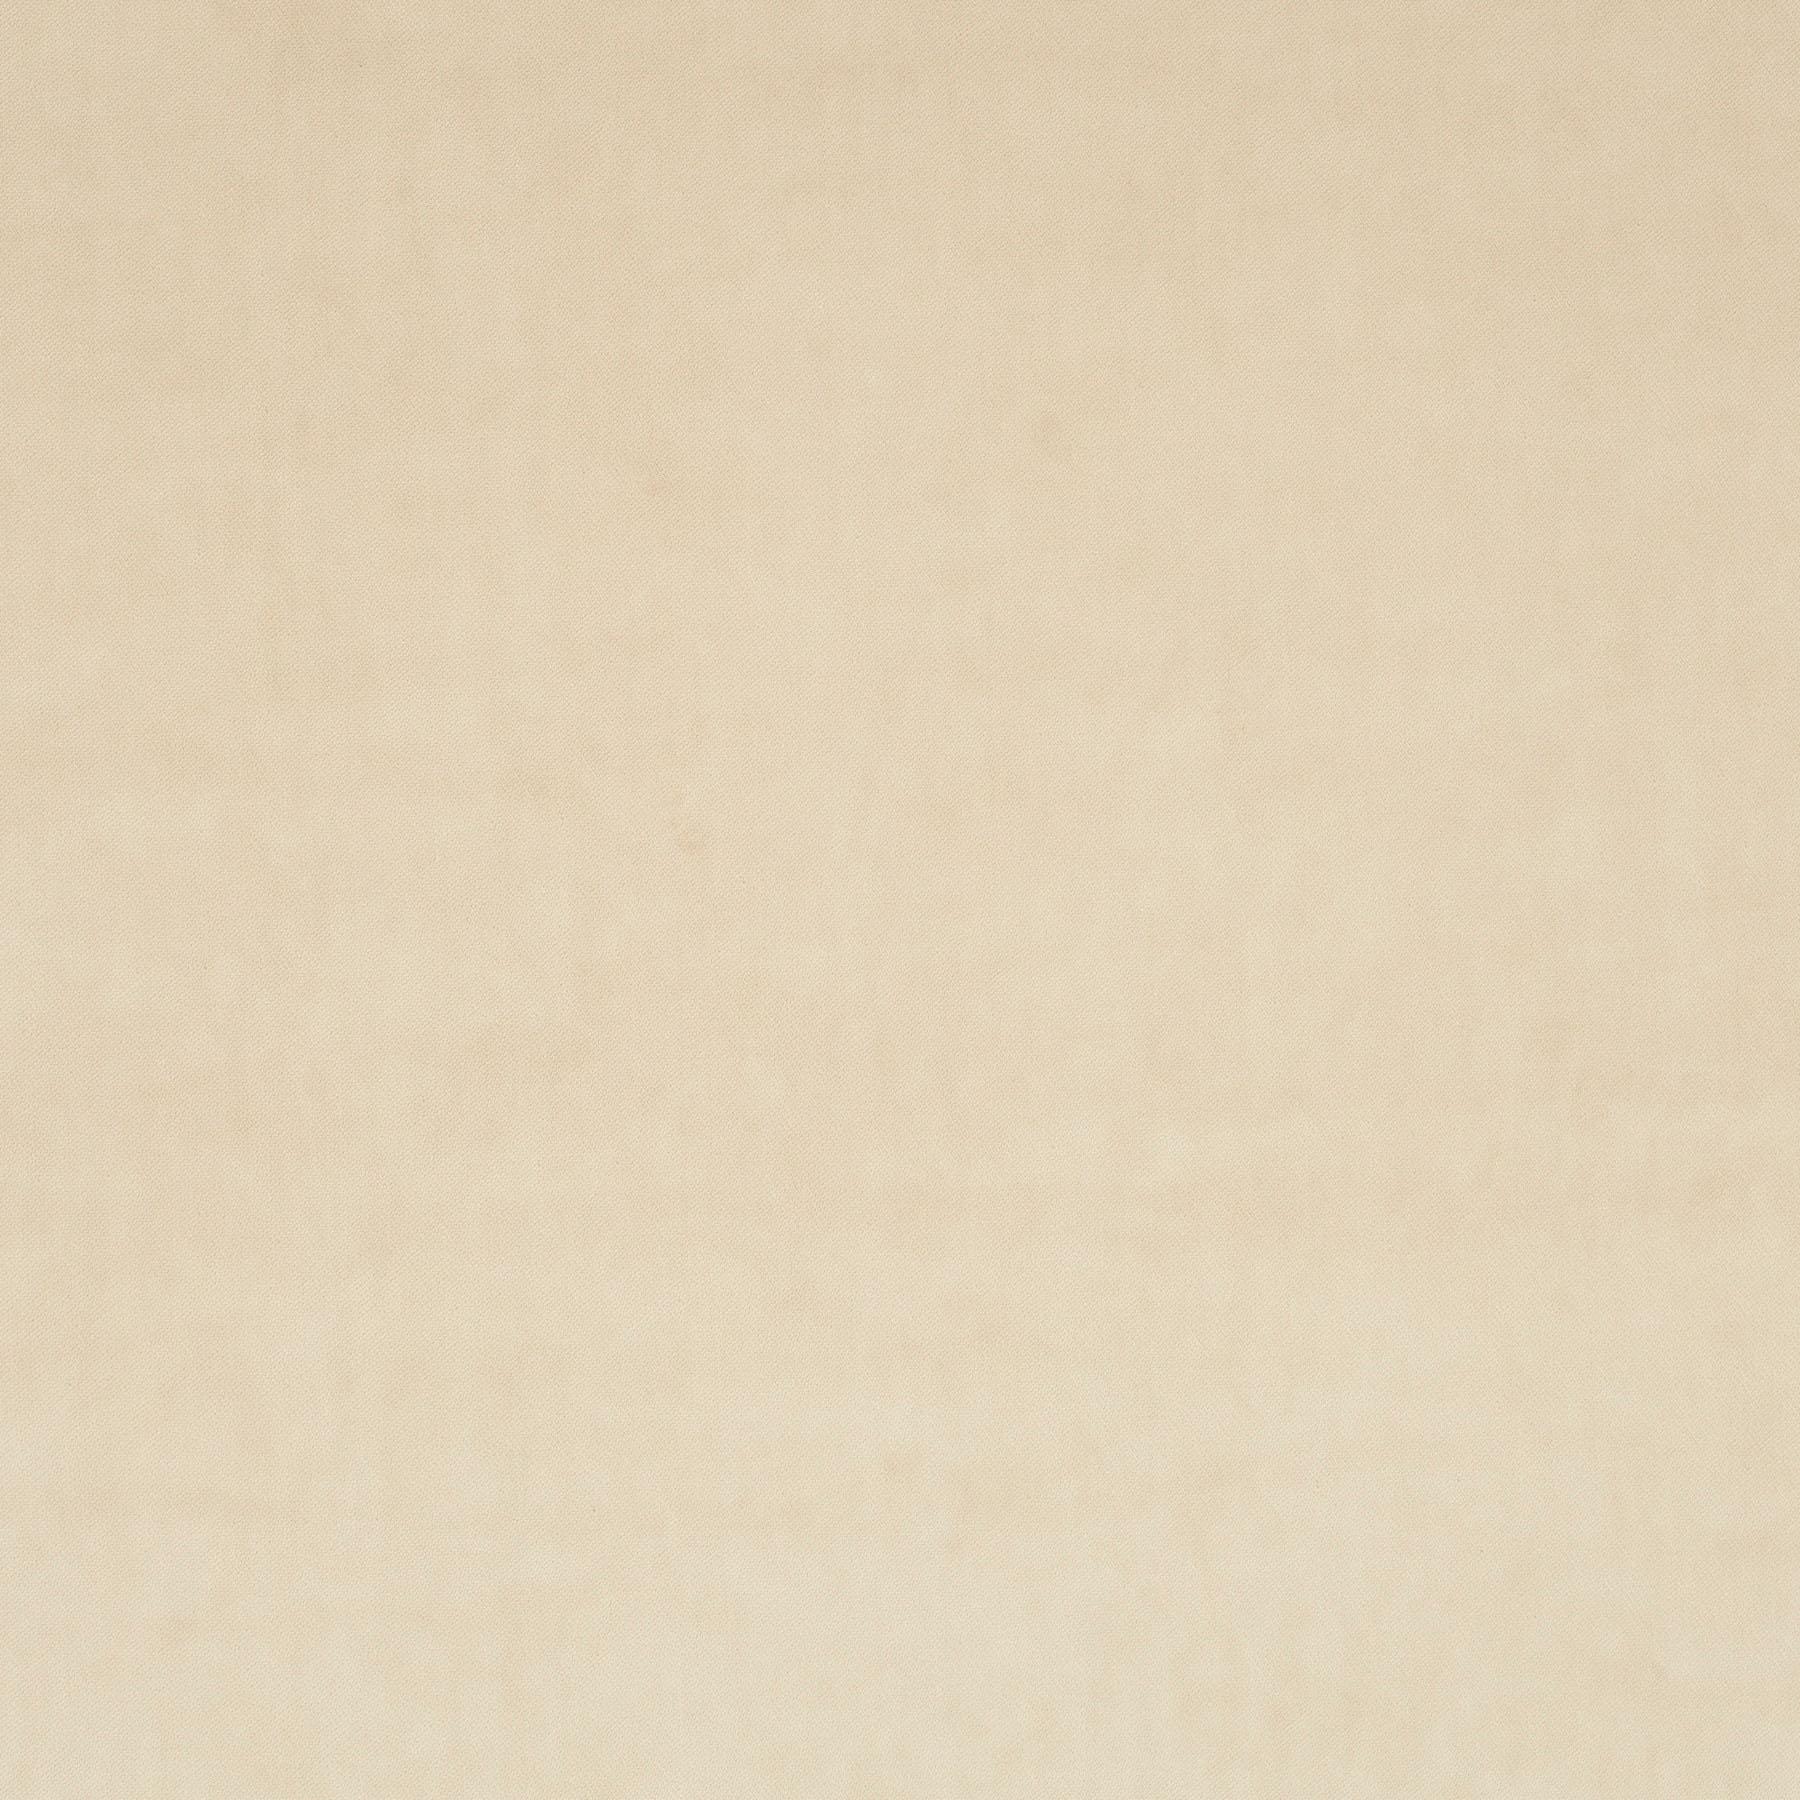 Upholstery Fabric Champion 1 3114 071 Jab Anstoetz Fabrics